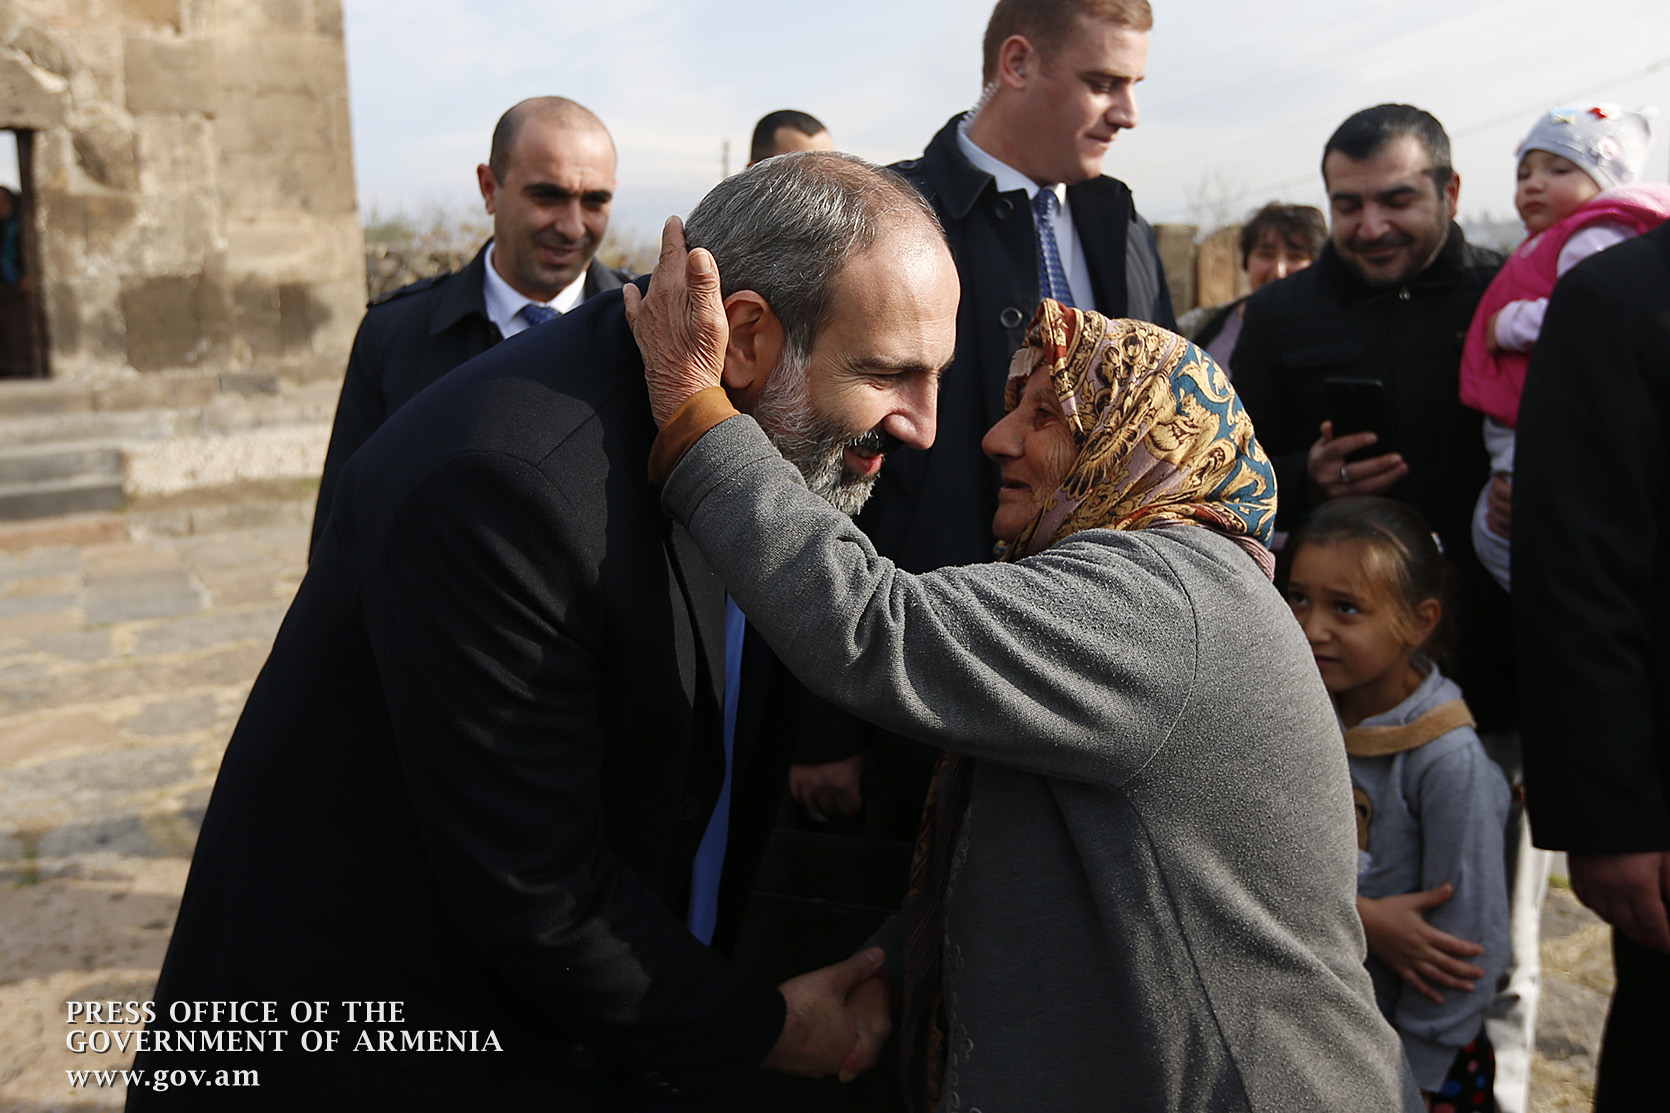 Photo of Համբուրում եմ ձեր ձեռքերը, որ ճաքերով են պատված. ՀՀ վարչապետ